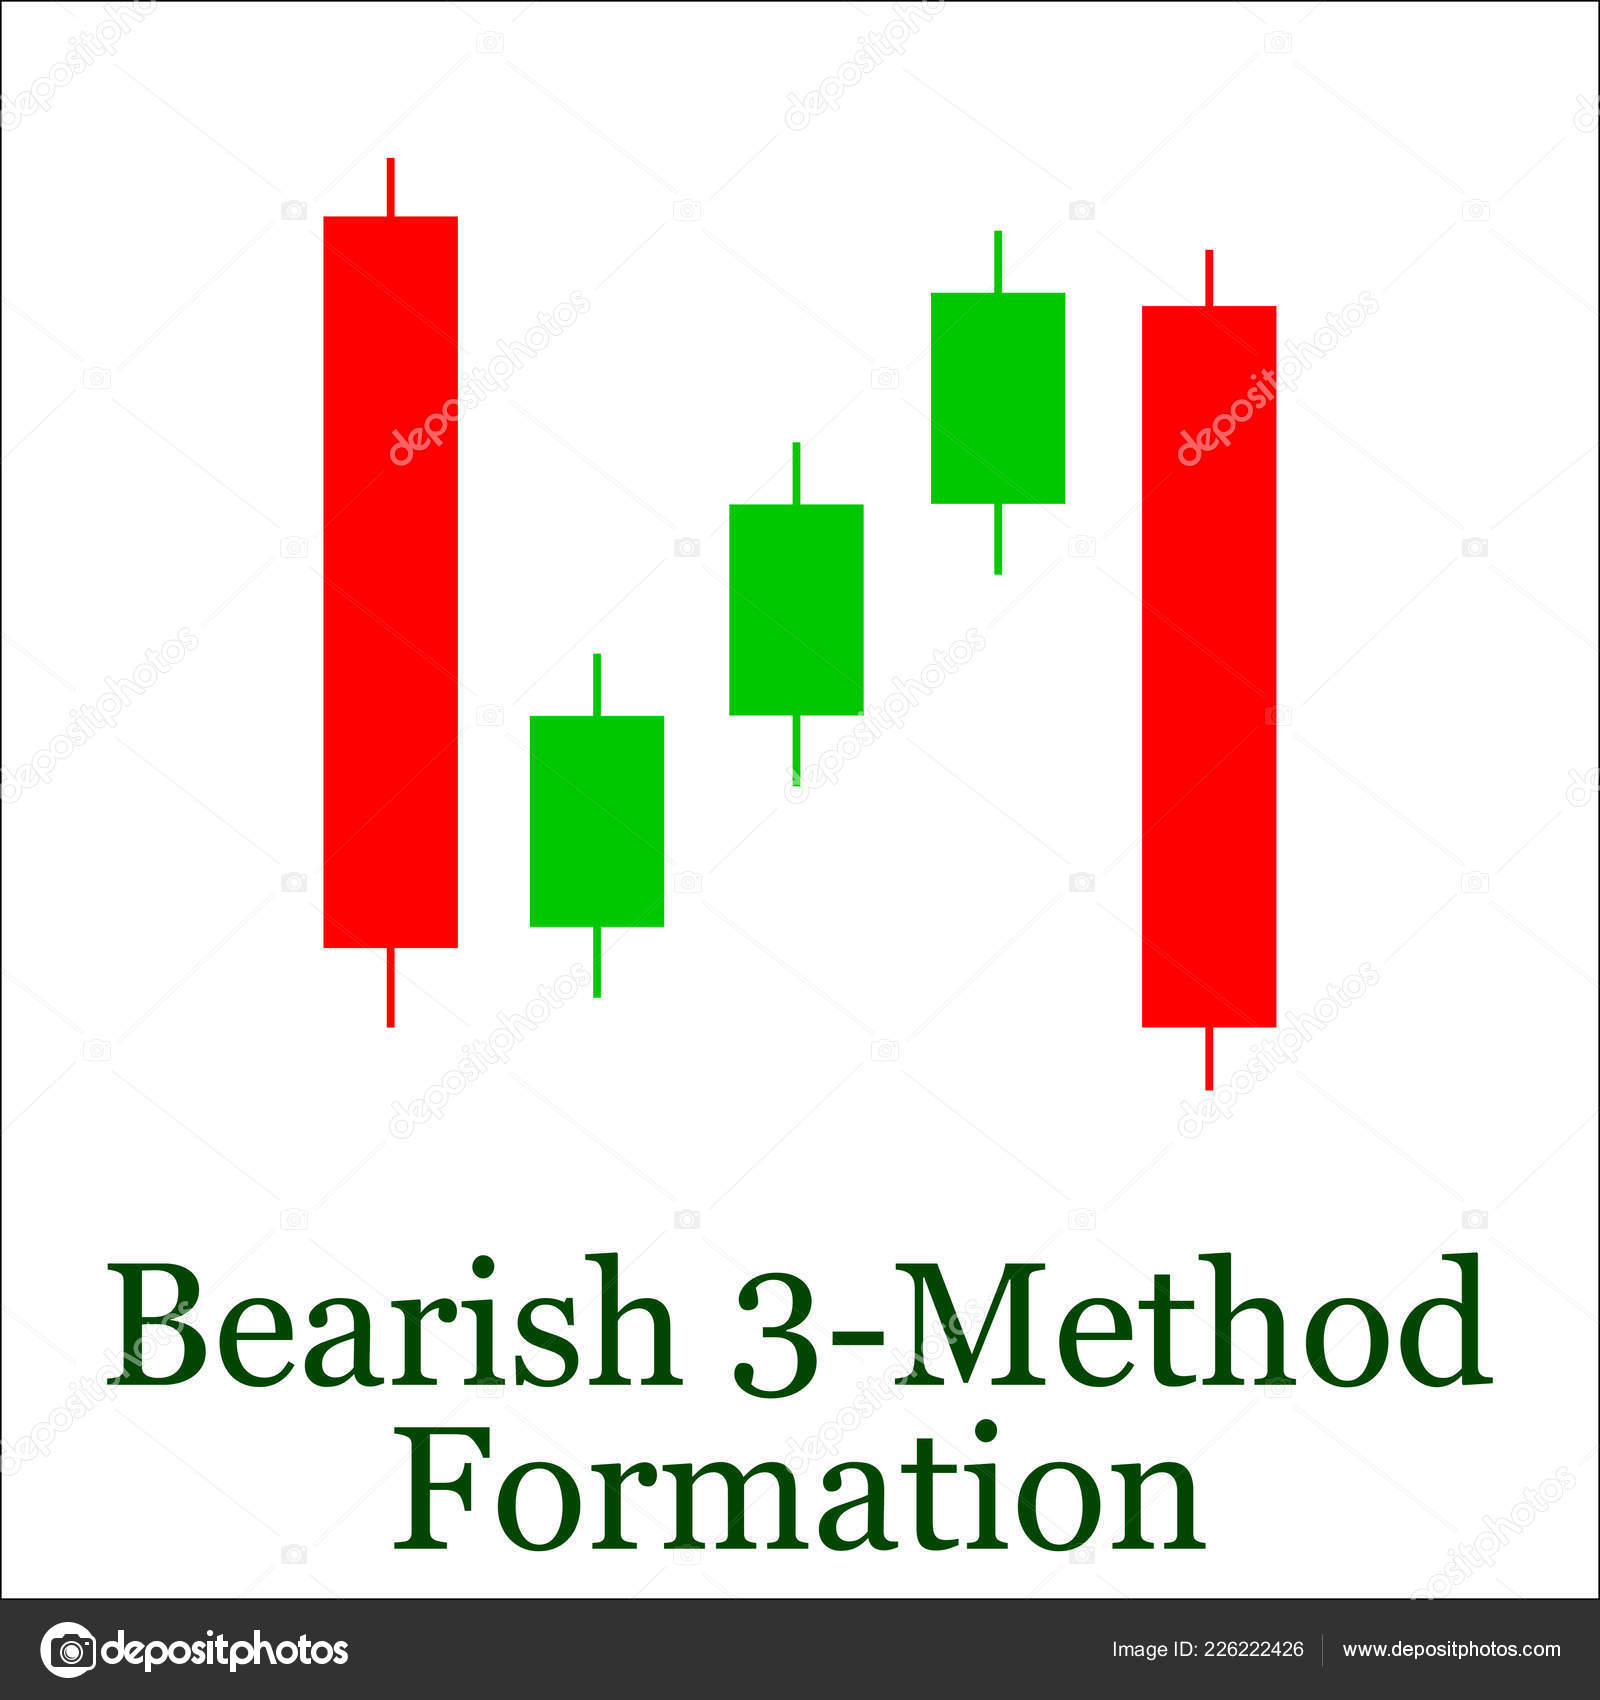 bearish method formation candlestick